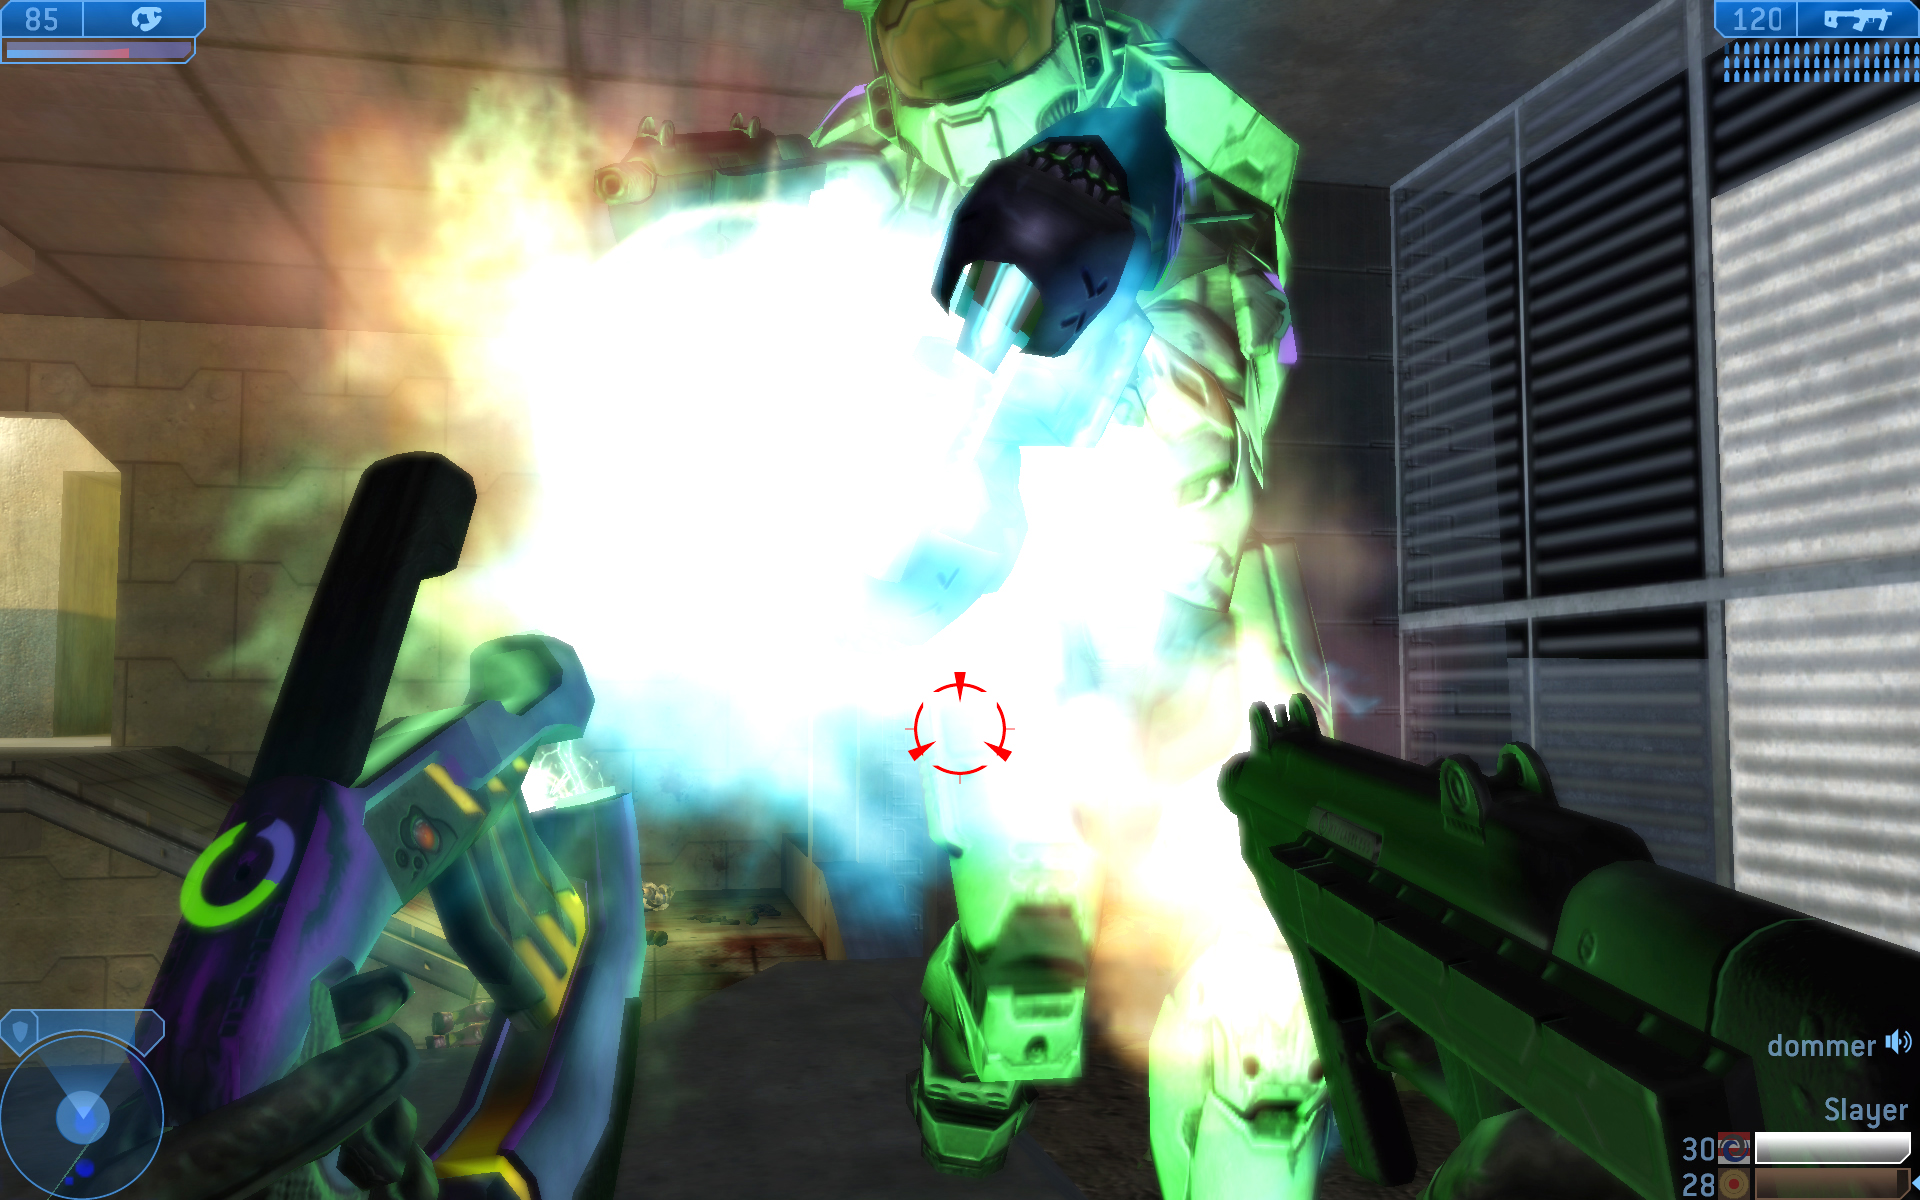 Bungie enhances Halo 2 for Windows Vista | TechPowerUp